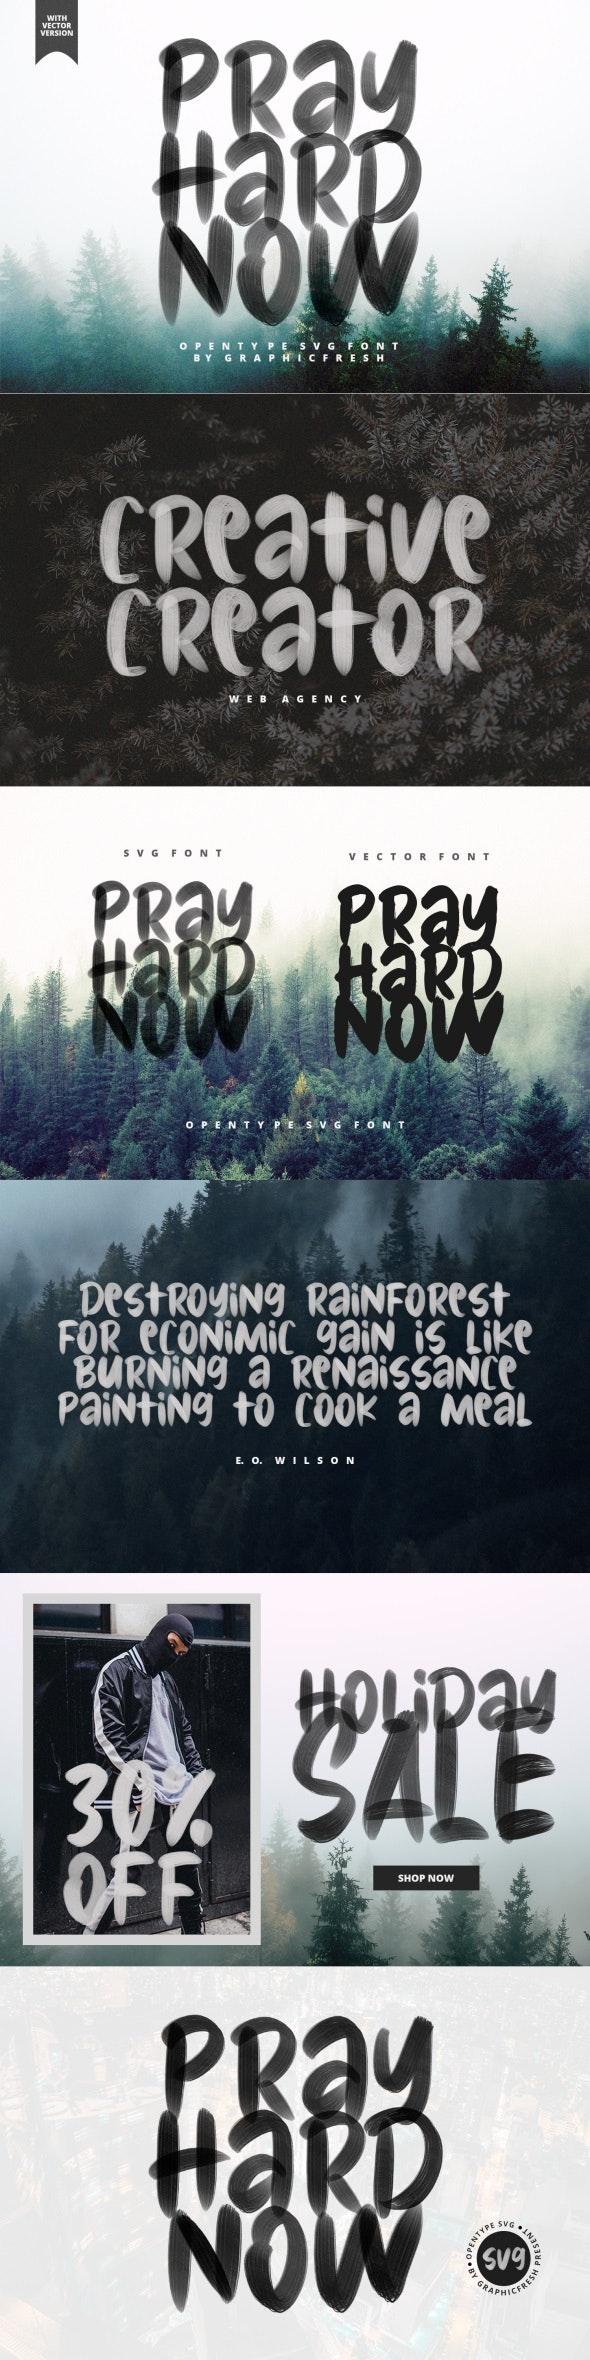 Pray Hard Now – 30% OFF – SVG Font - Graffiti Fonts